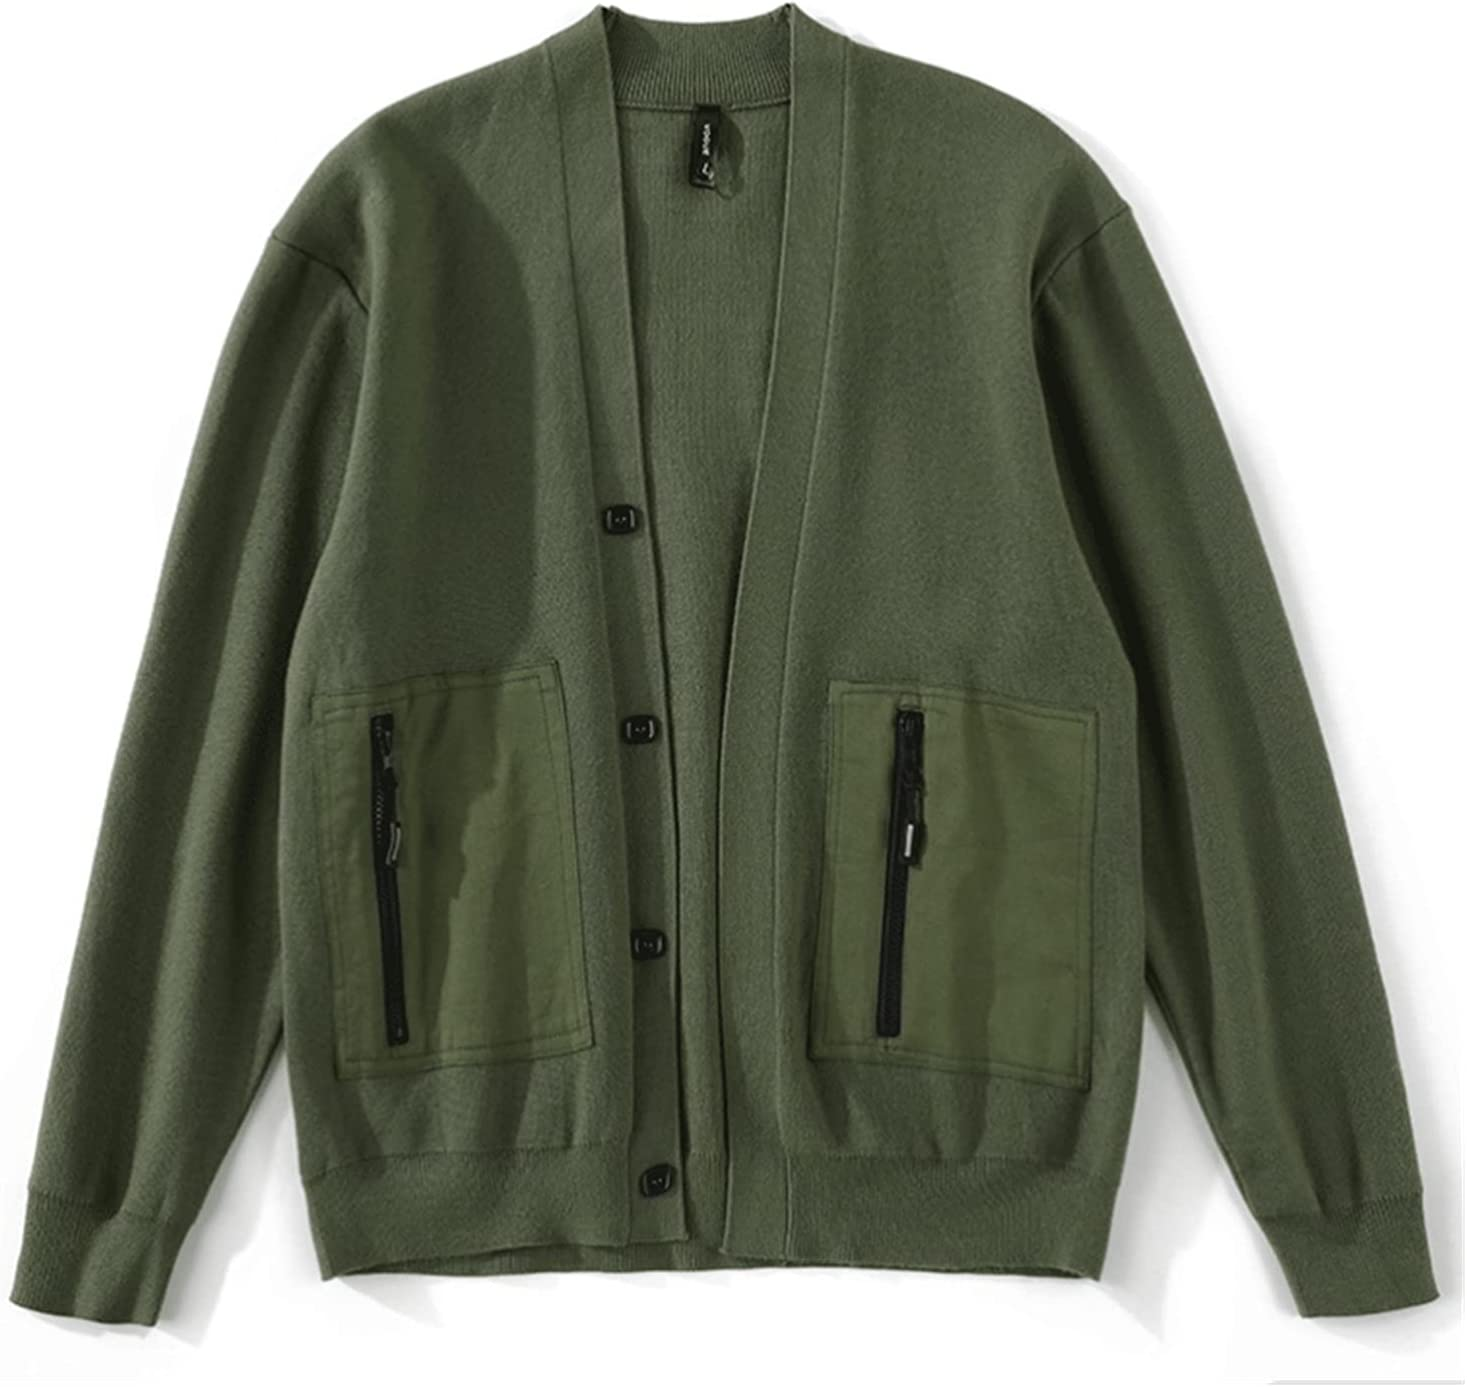 UXZDX Knit Cardigan Stitching Zipper Pocket Decoration Men's Retro Slim Knit Cardigan (Color : Green, Size : XXXXL Code)